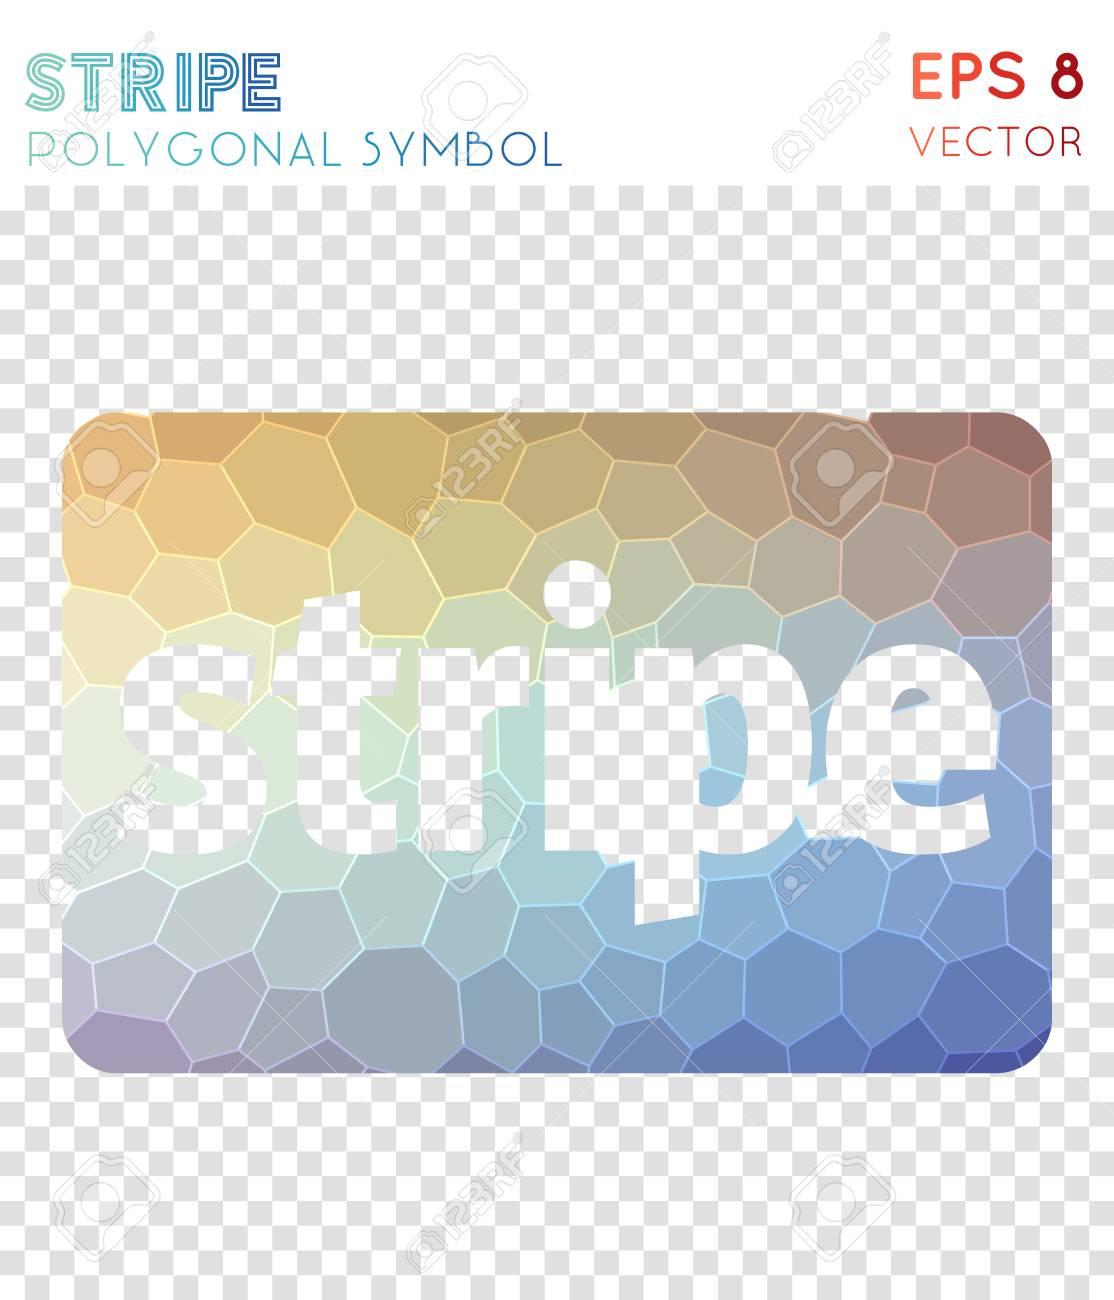 Cc stripe polygonal symbol  Adorable mosaic style symbol  Energetic